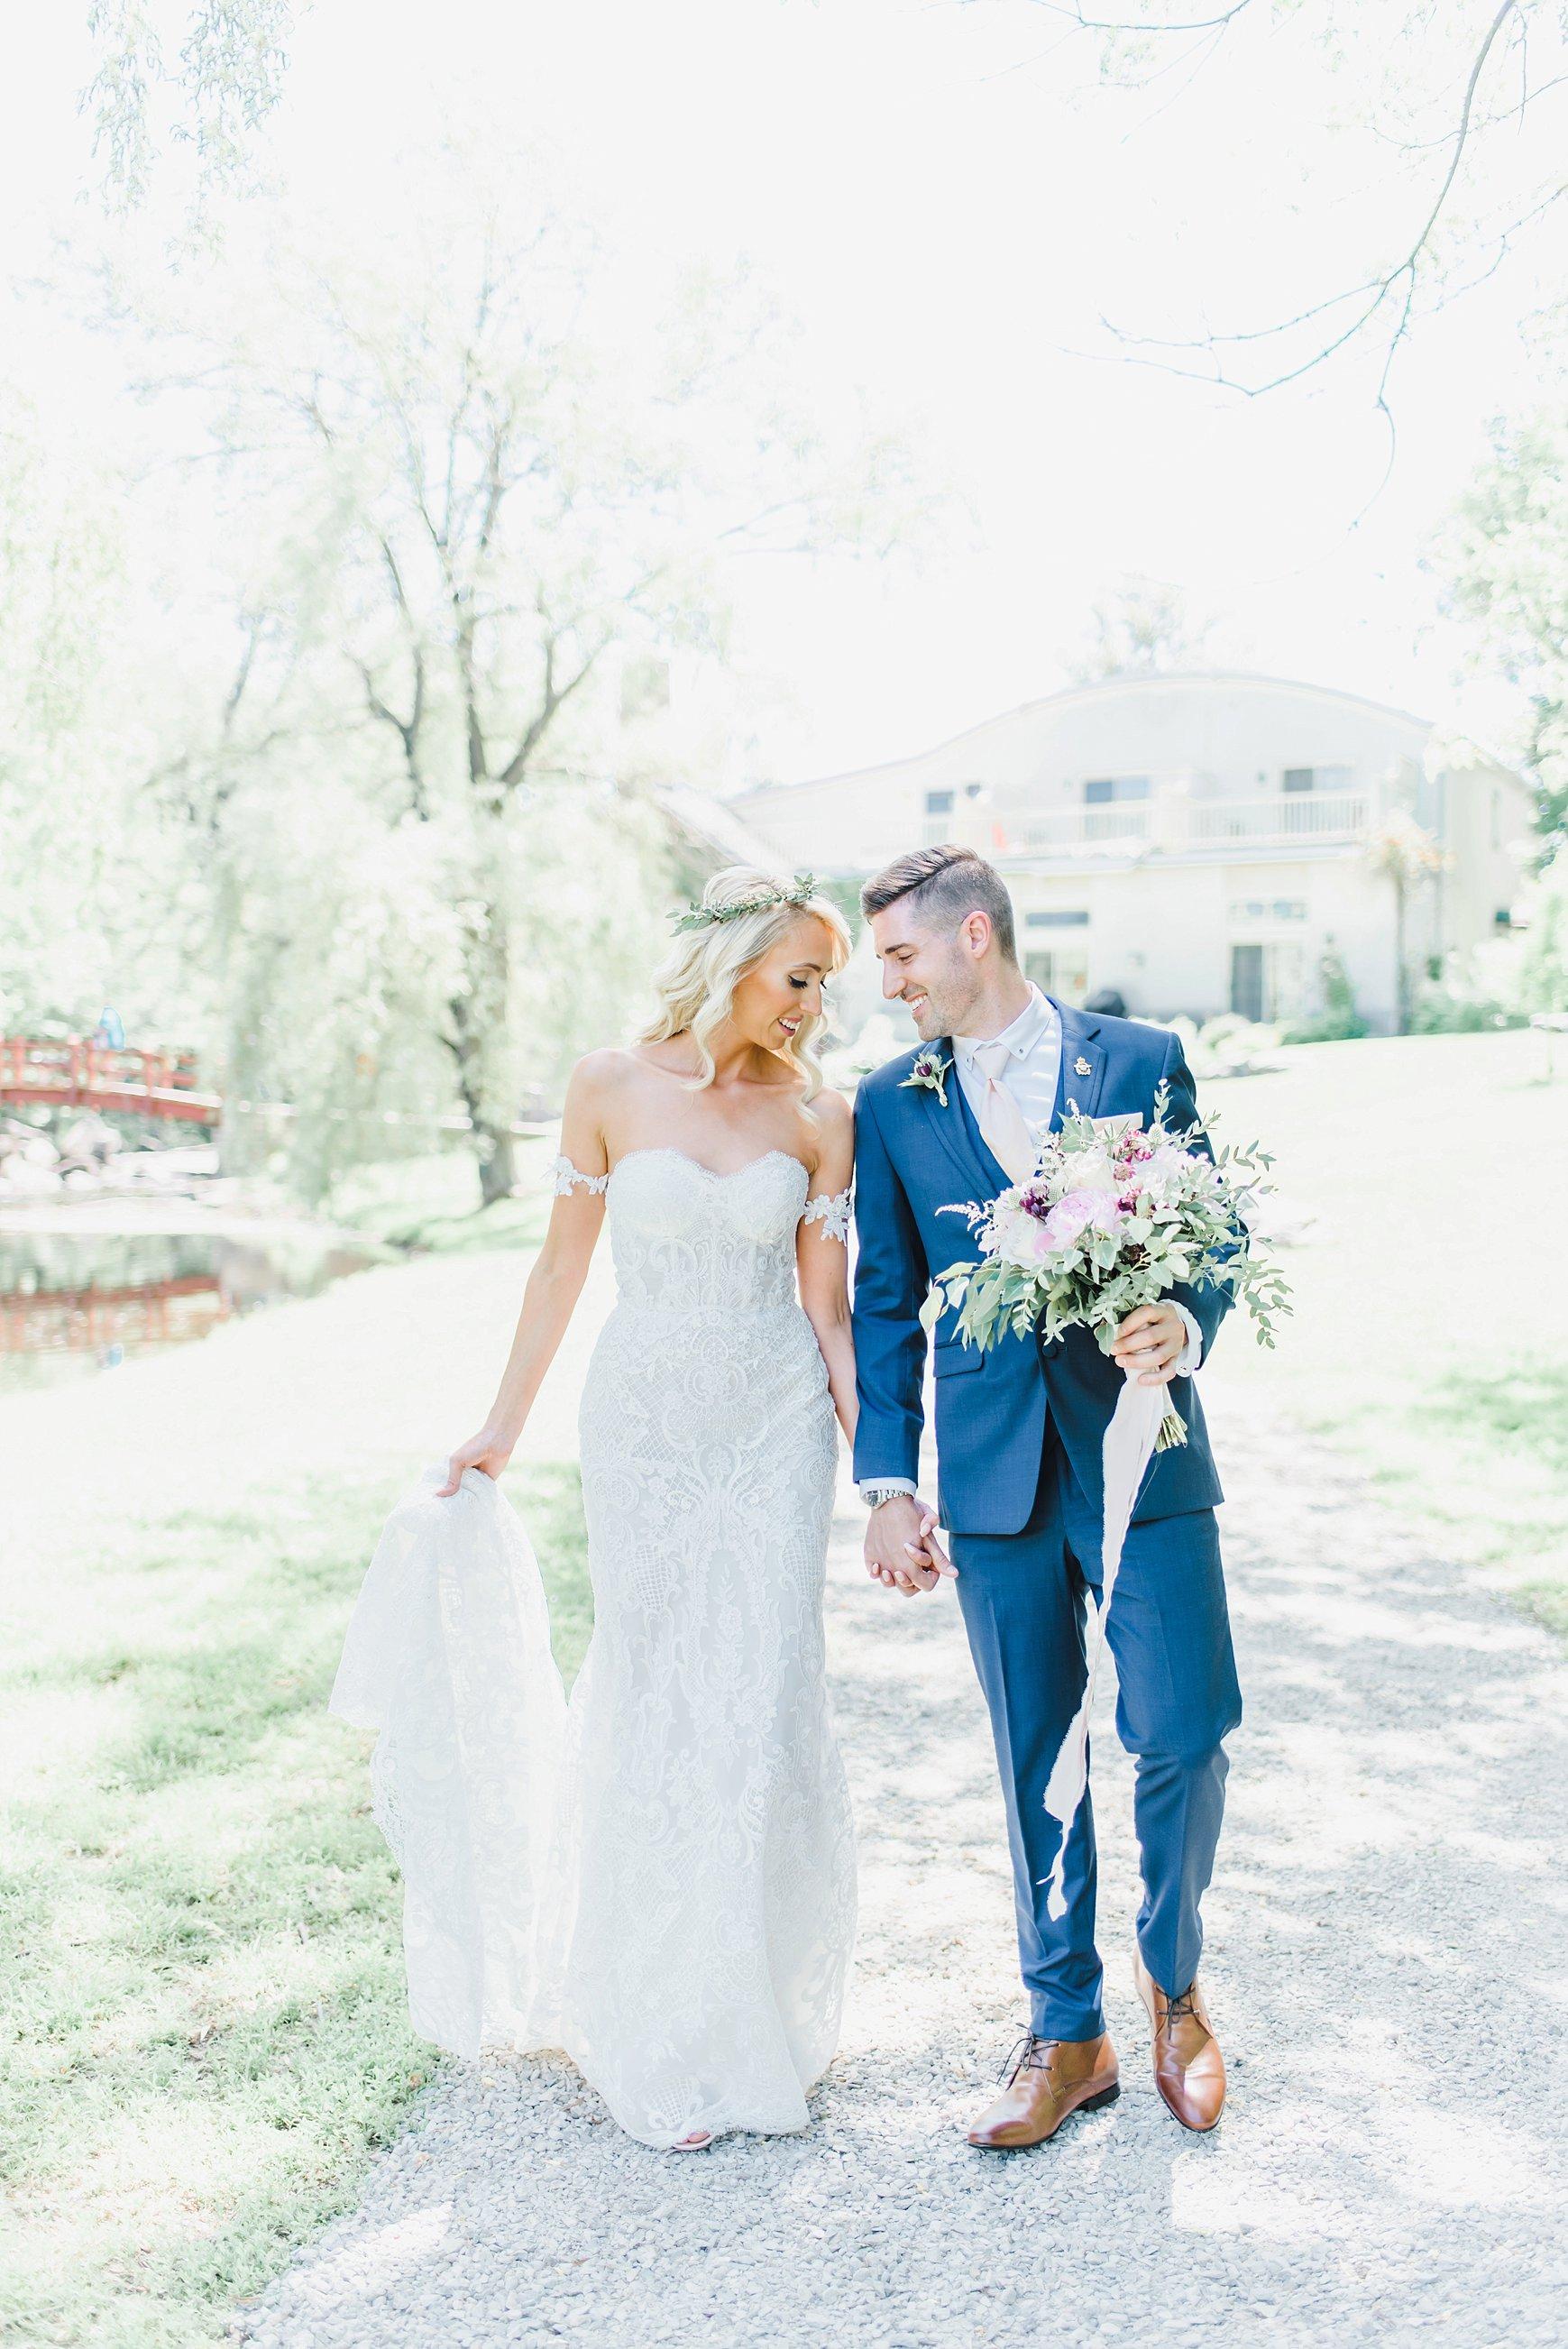 light airy indie fine art ottawa wedding photographer | Ali and Batoul Photography_0044.jpg